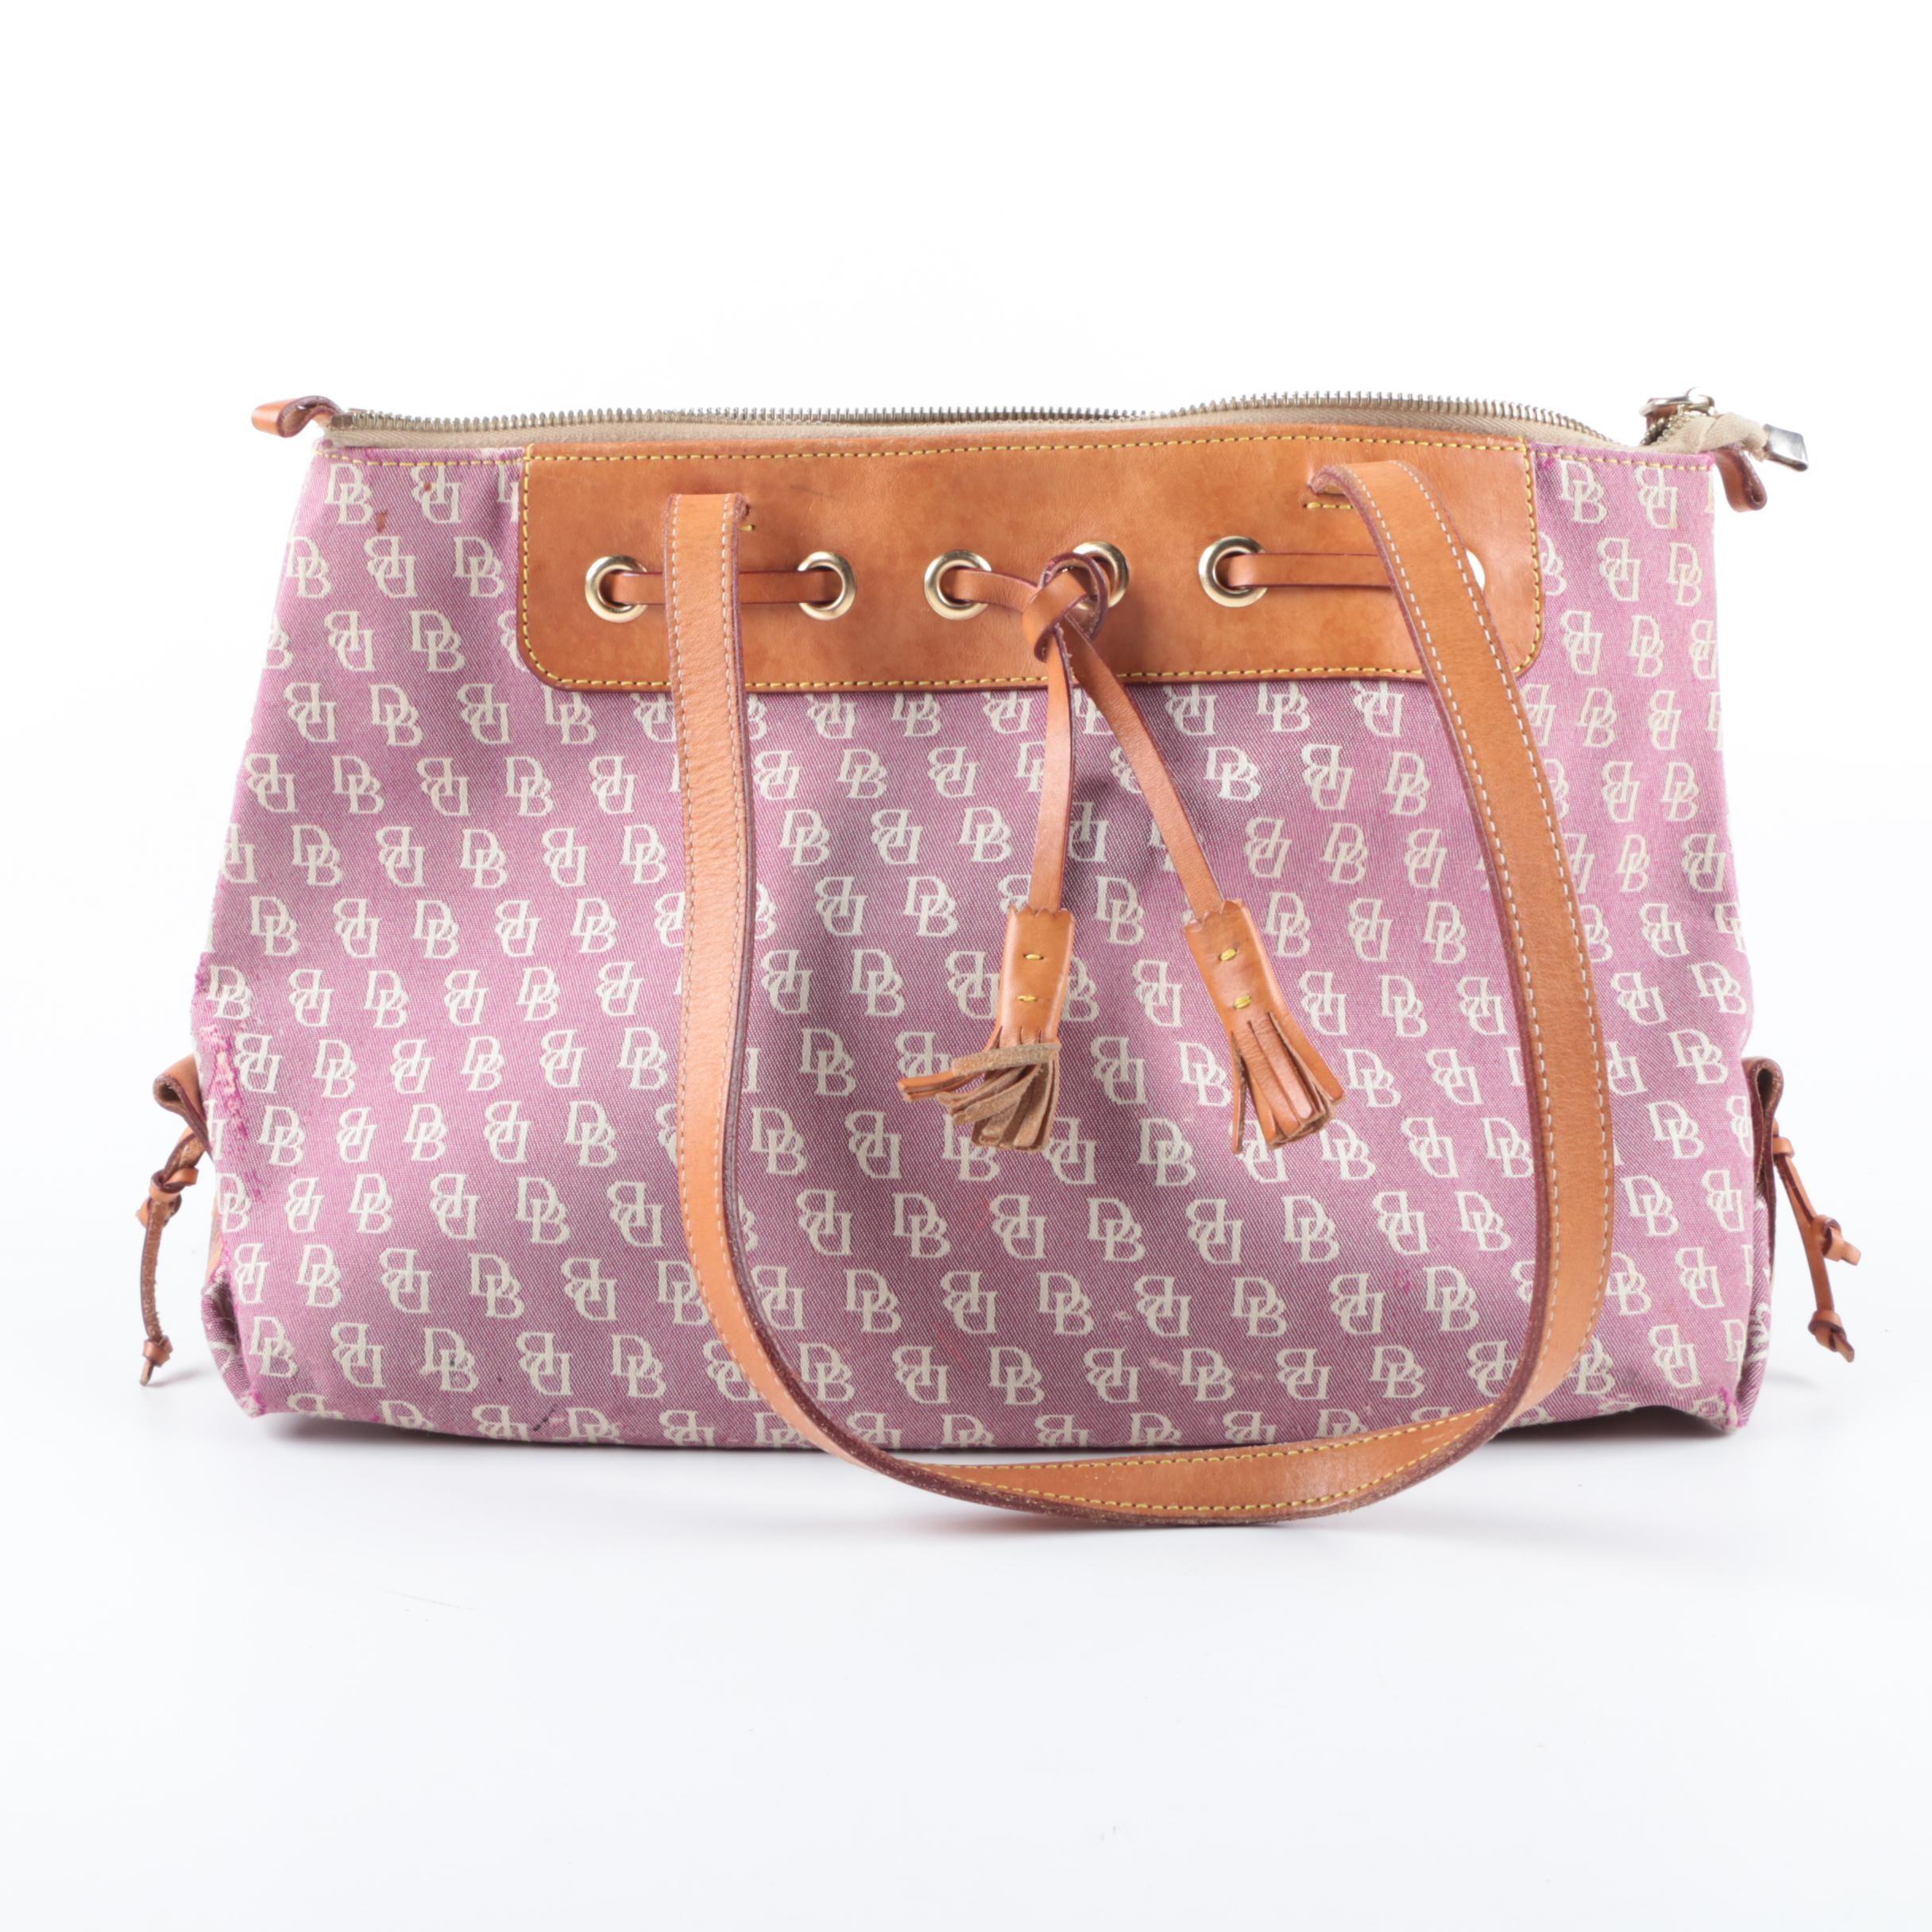 Dooney & Bourke Signature Shoulder Bag